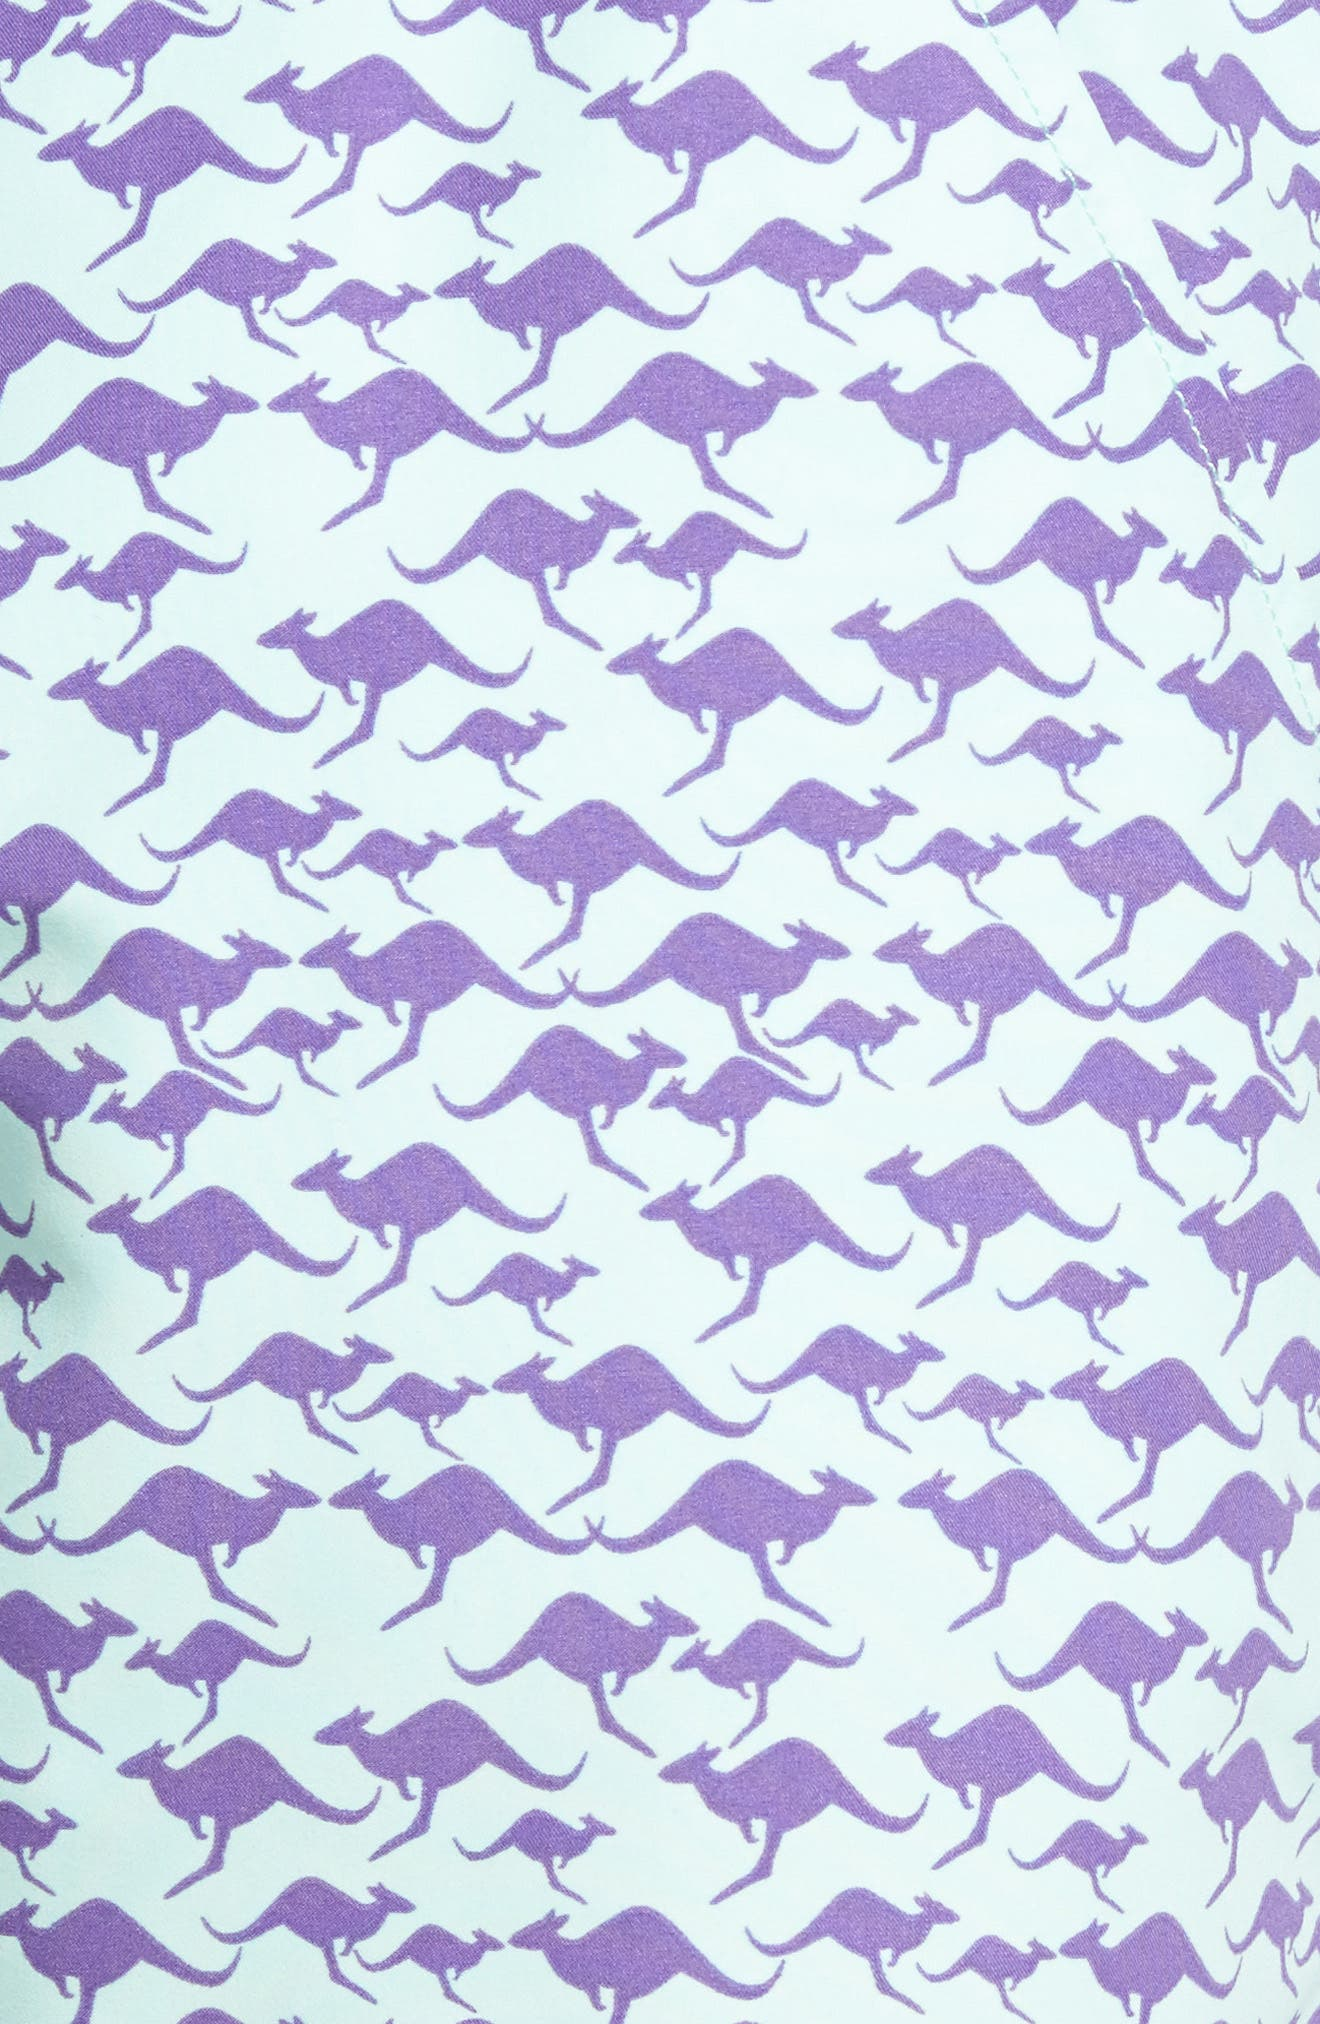 Kangaroo Print Swim Trunks,                             Alternate thumbnail 5, color,                             500